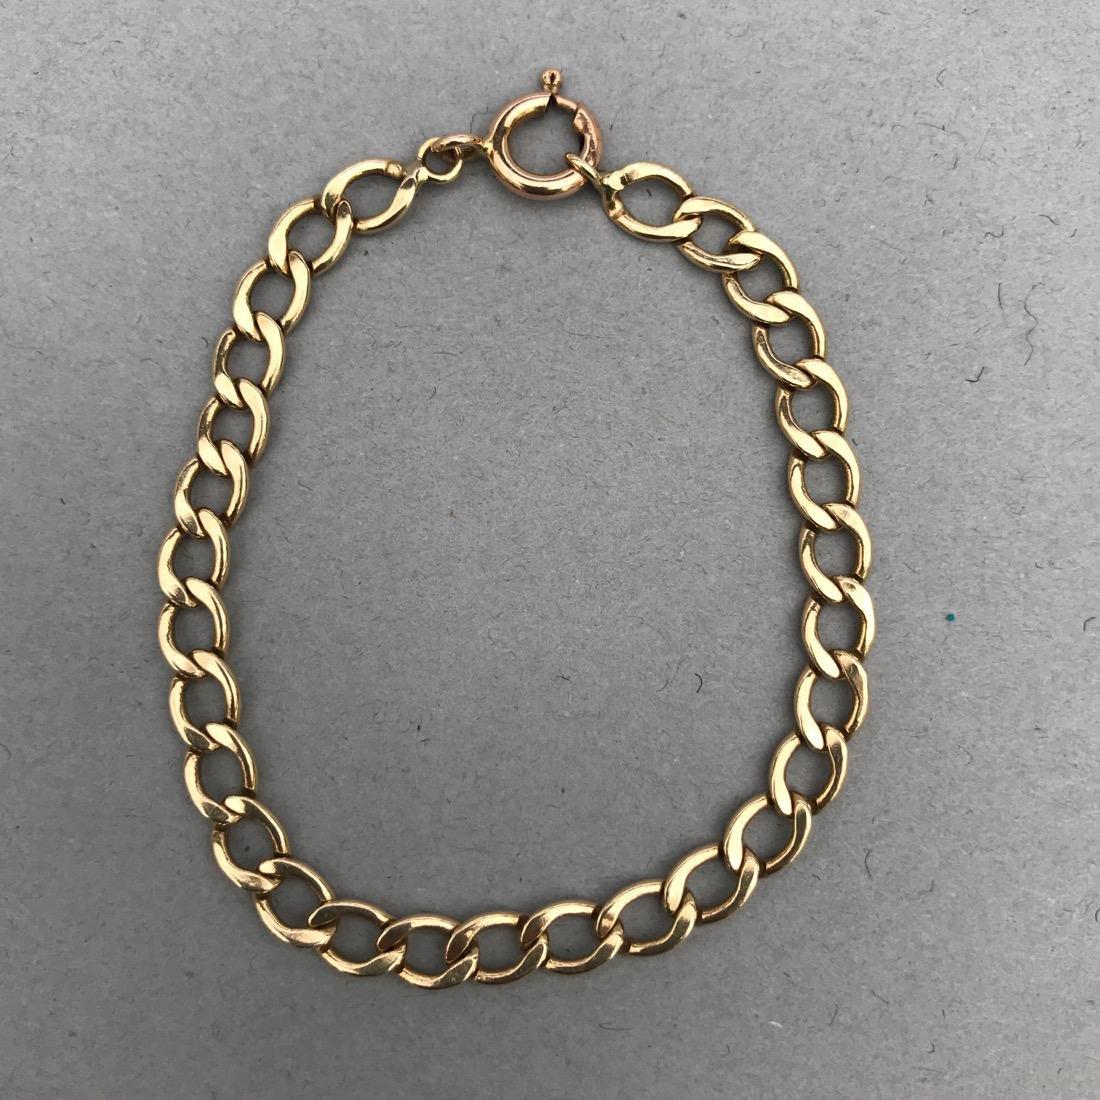 14K Gold Chain Link Bracelet